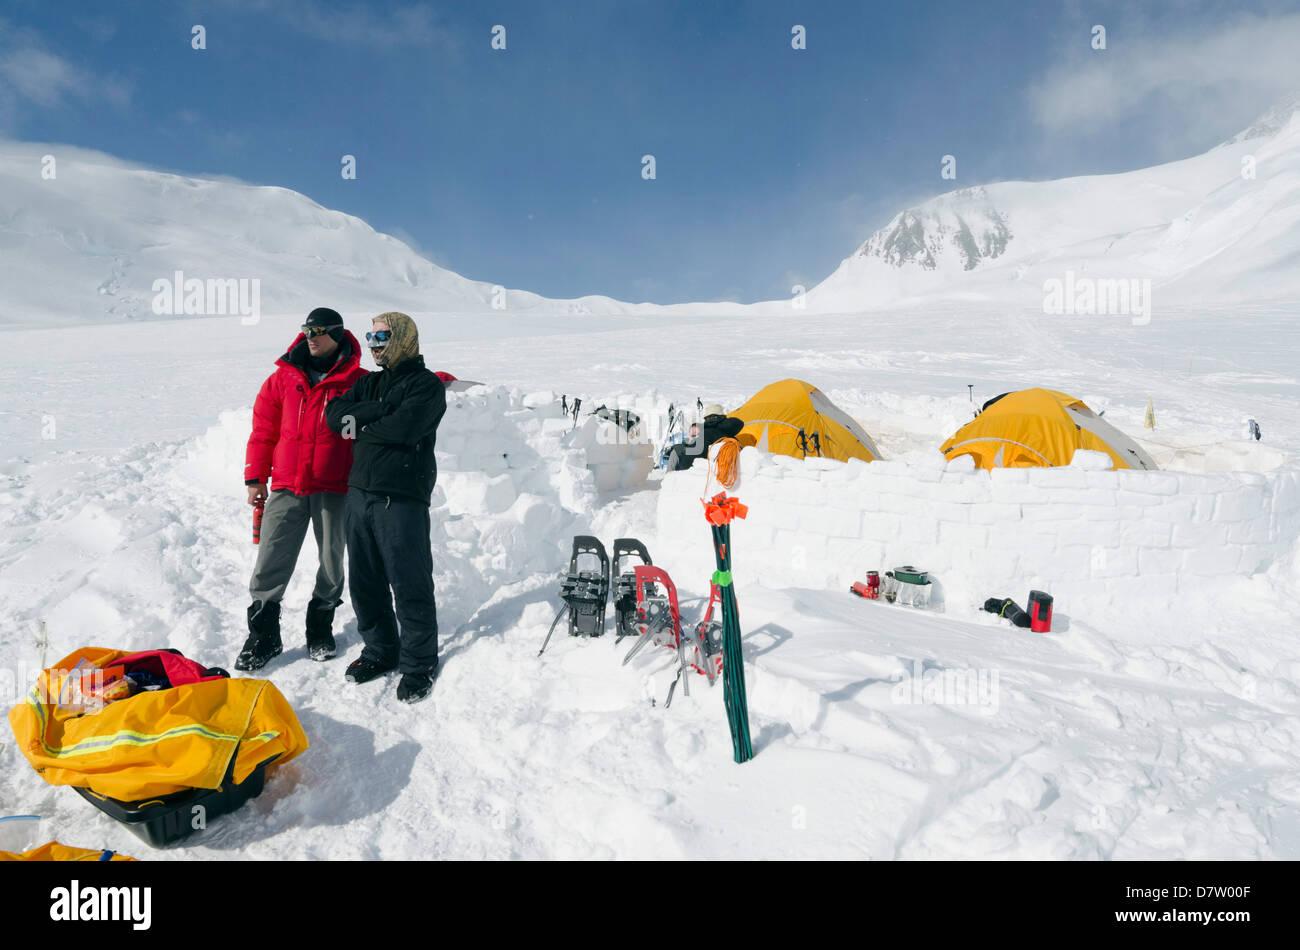 Camp 2, Klettern Expedition auf den Mount McKinley, 6194m, Denali National Park, Alaska, USA Stockbild